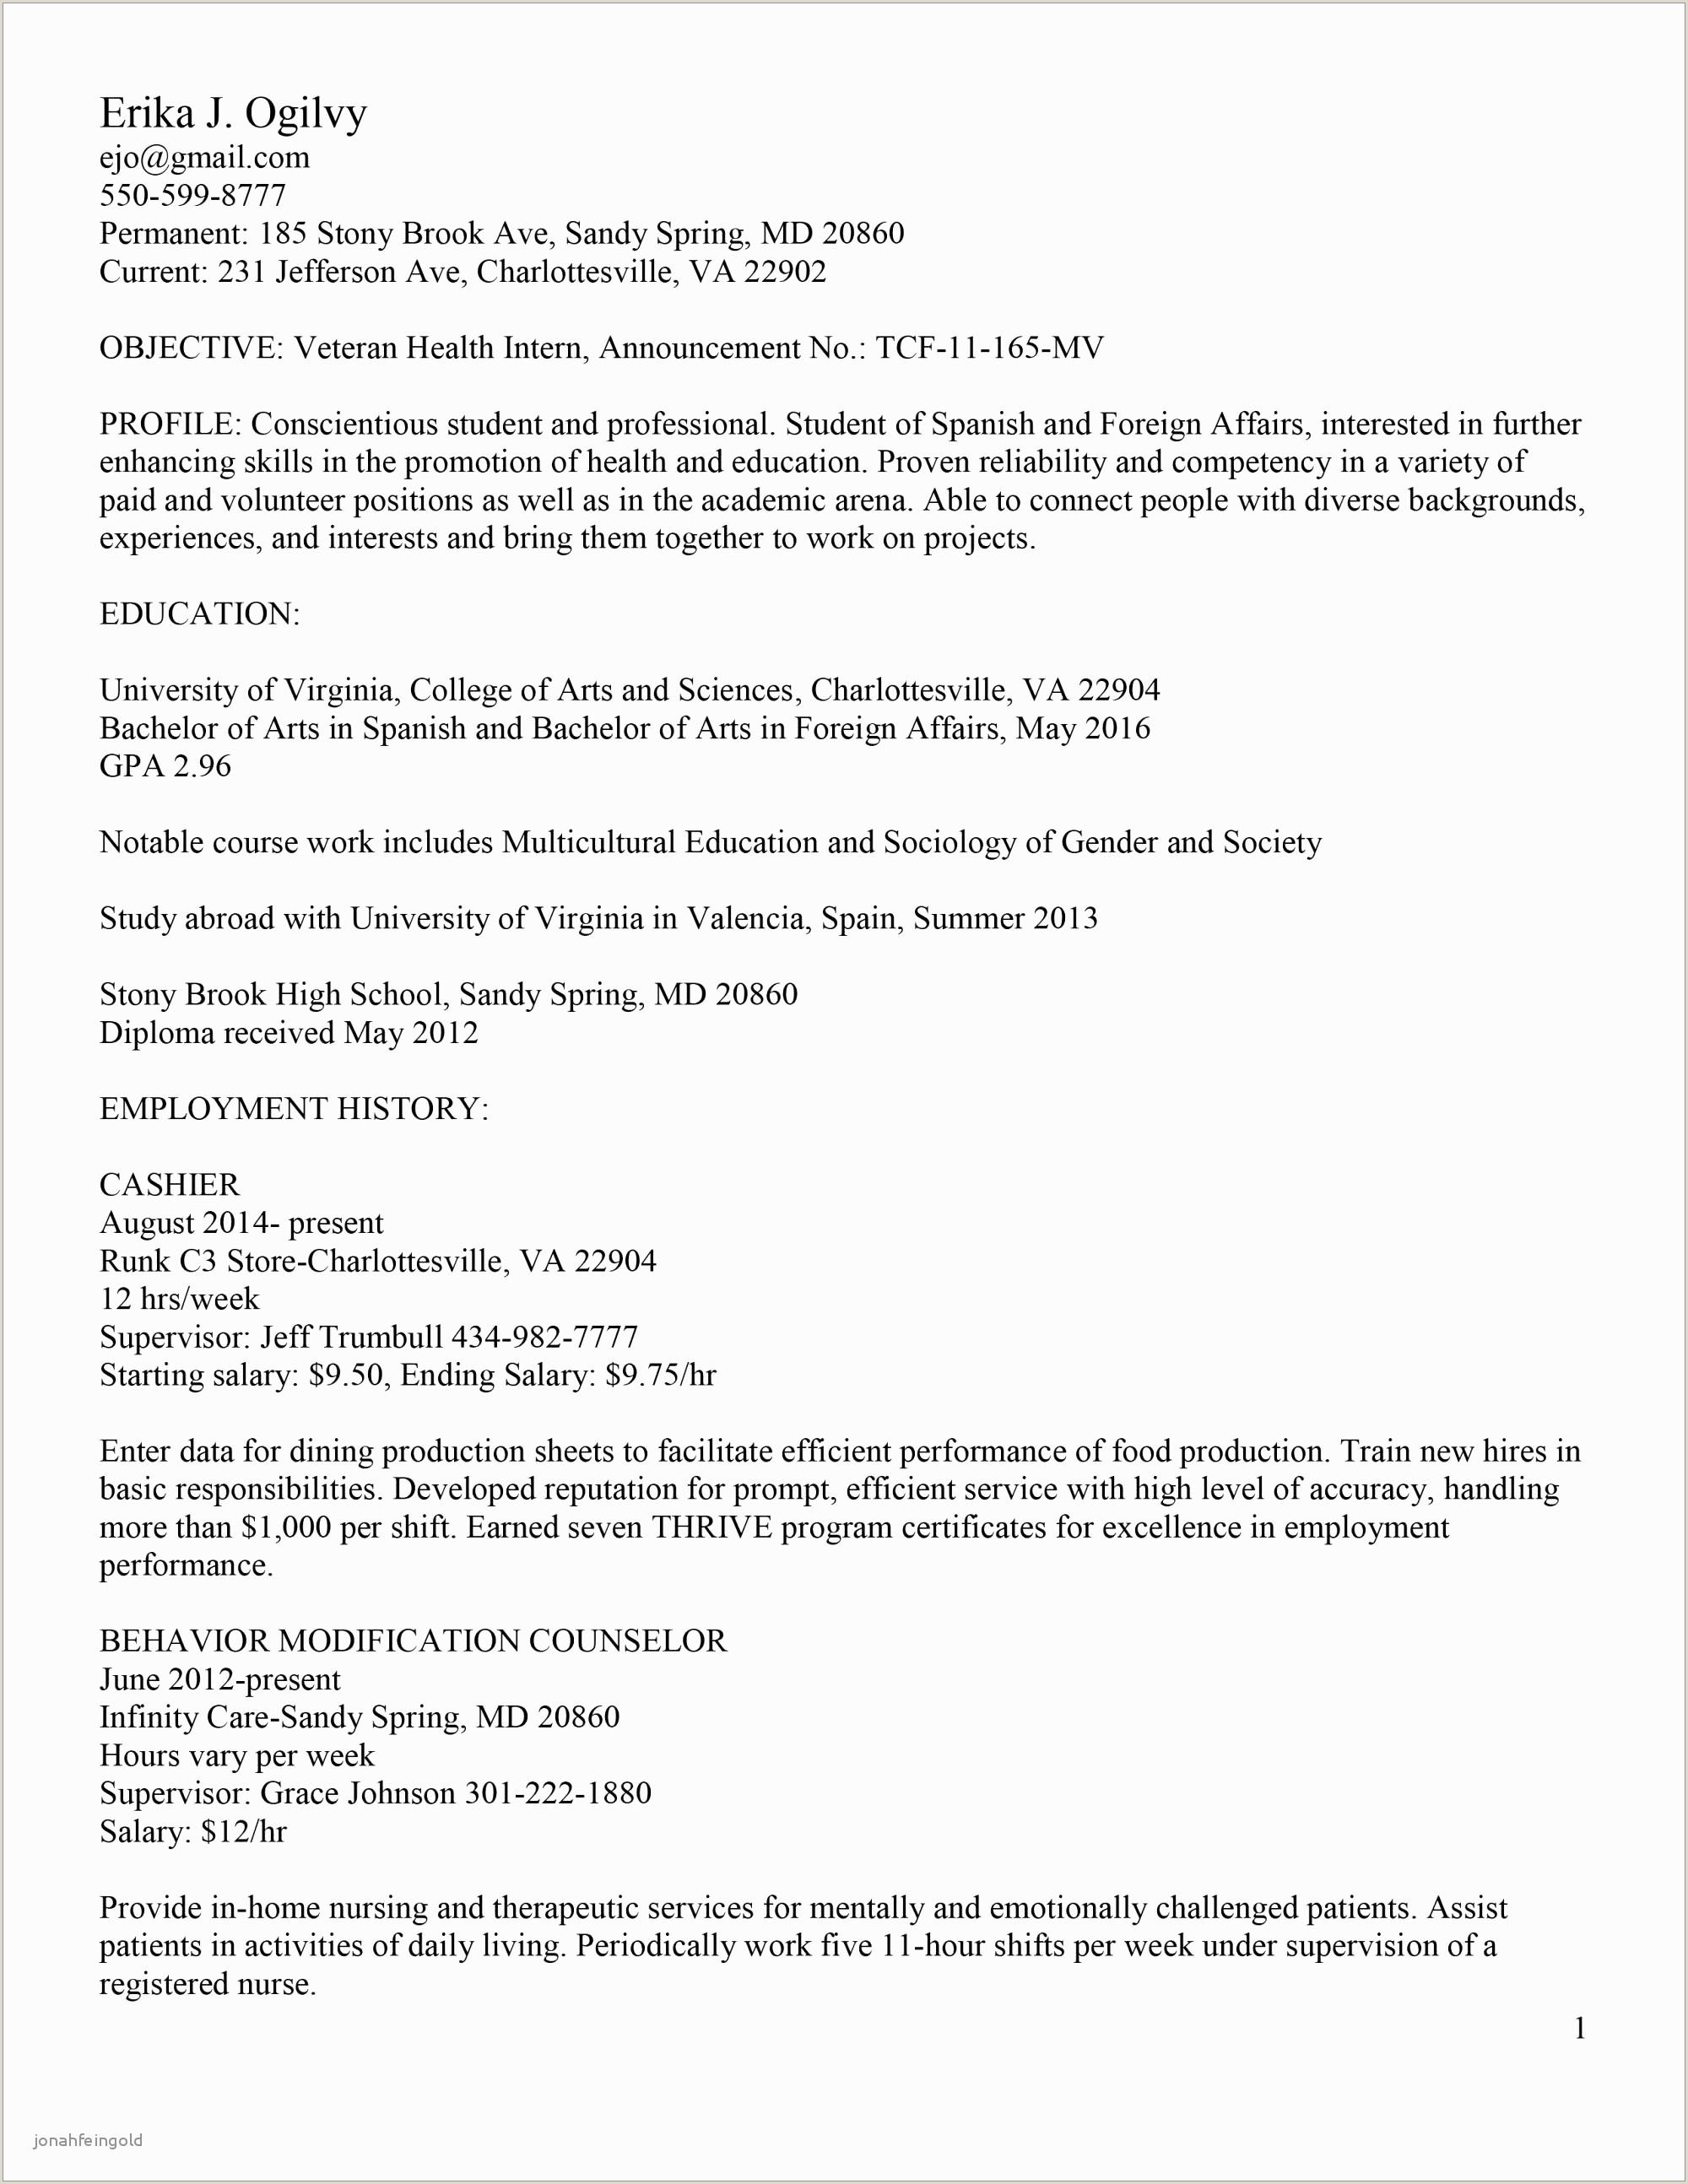 Cv En Espanol Nouveau Spanish Resume Template Resume Sample